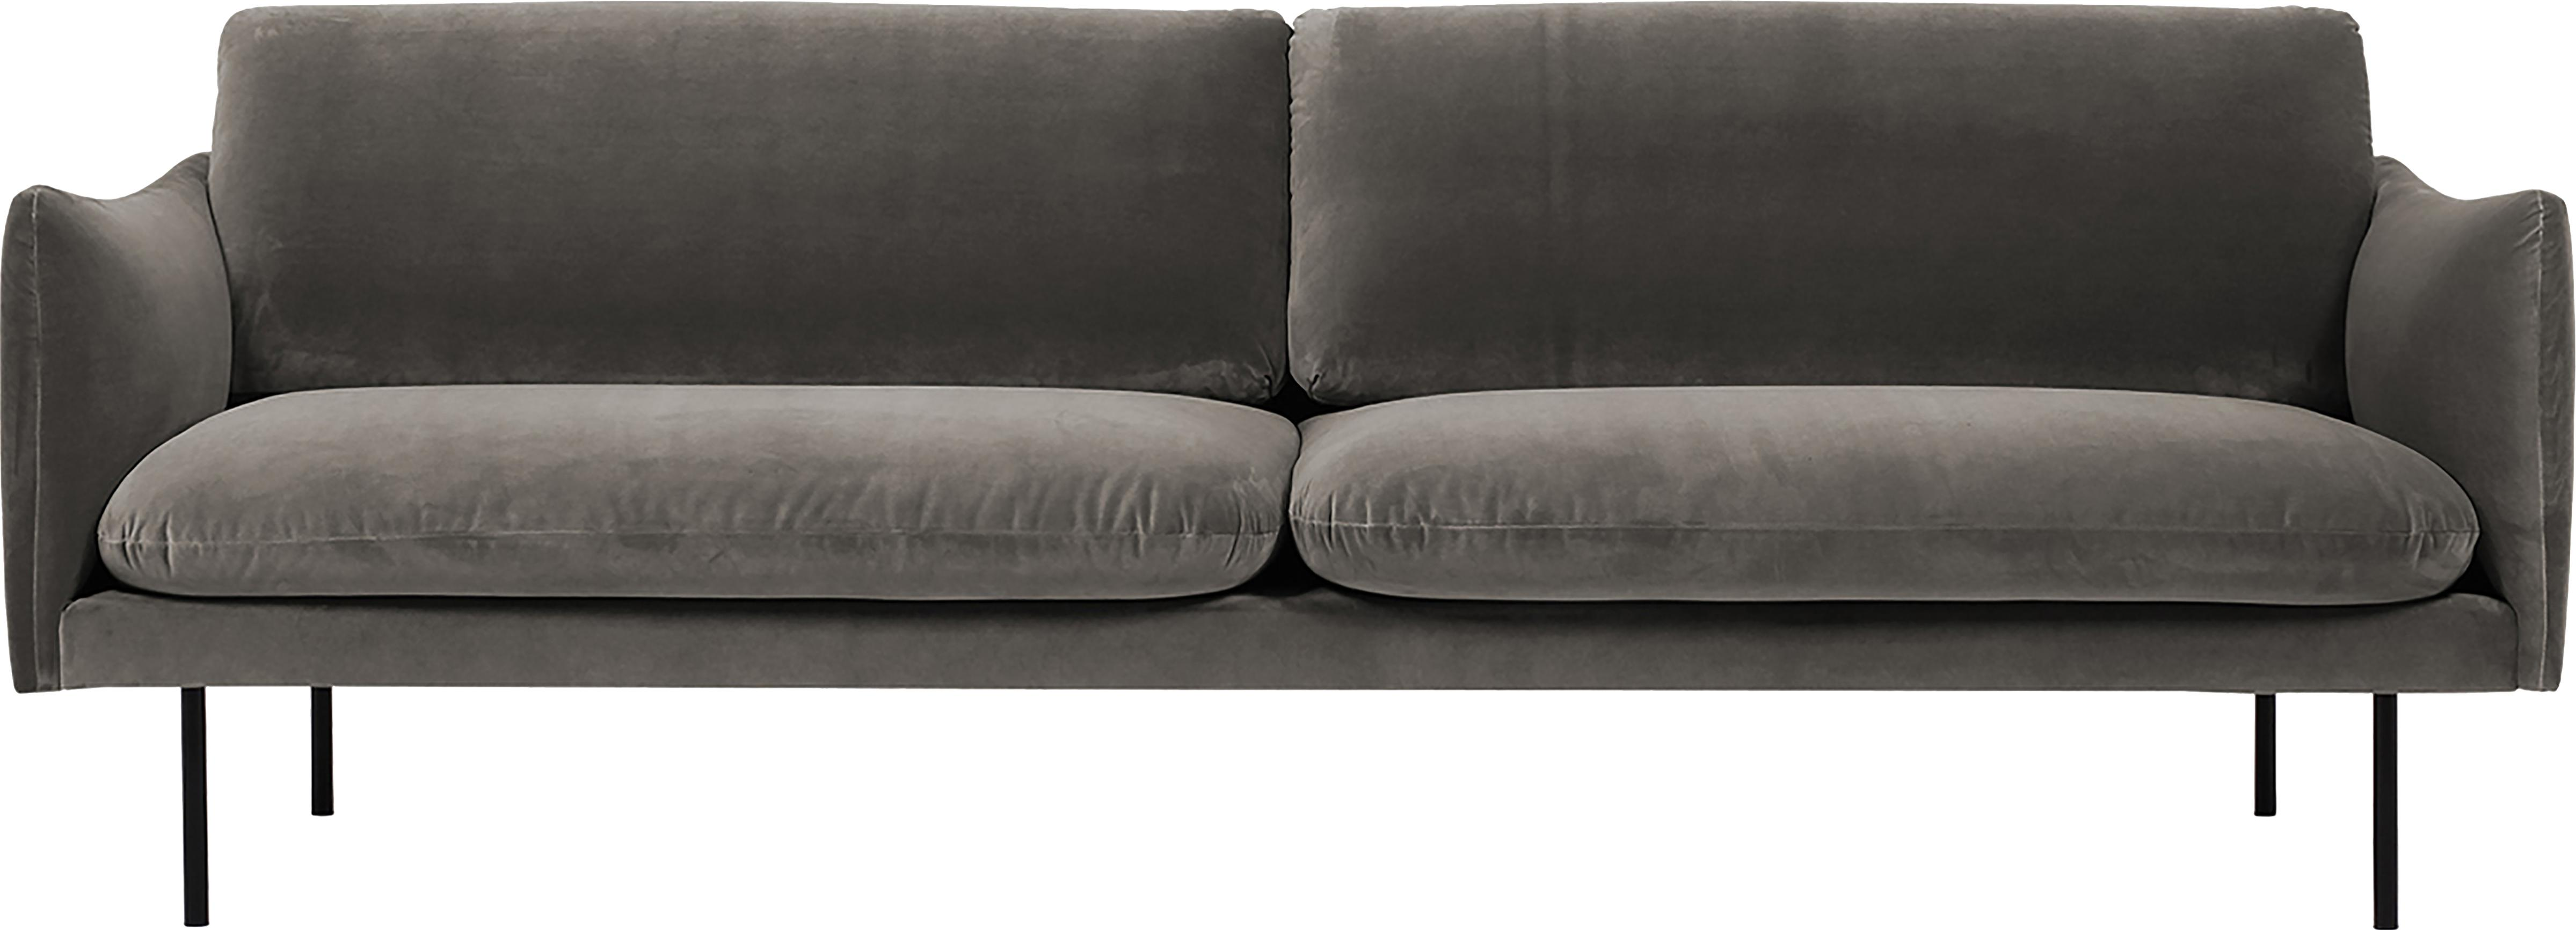 Samt-Sofa Moby (3-Sitzer), Bezug: Samt (Hochwertiger Polyes, Gestell: Massives Kiefernholz, Samt Braungrau, B 220 x T 95 cm